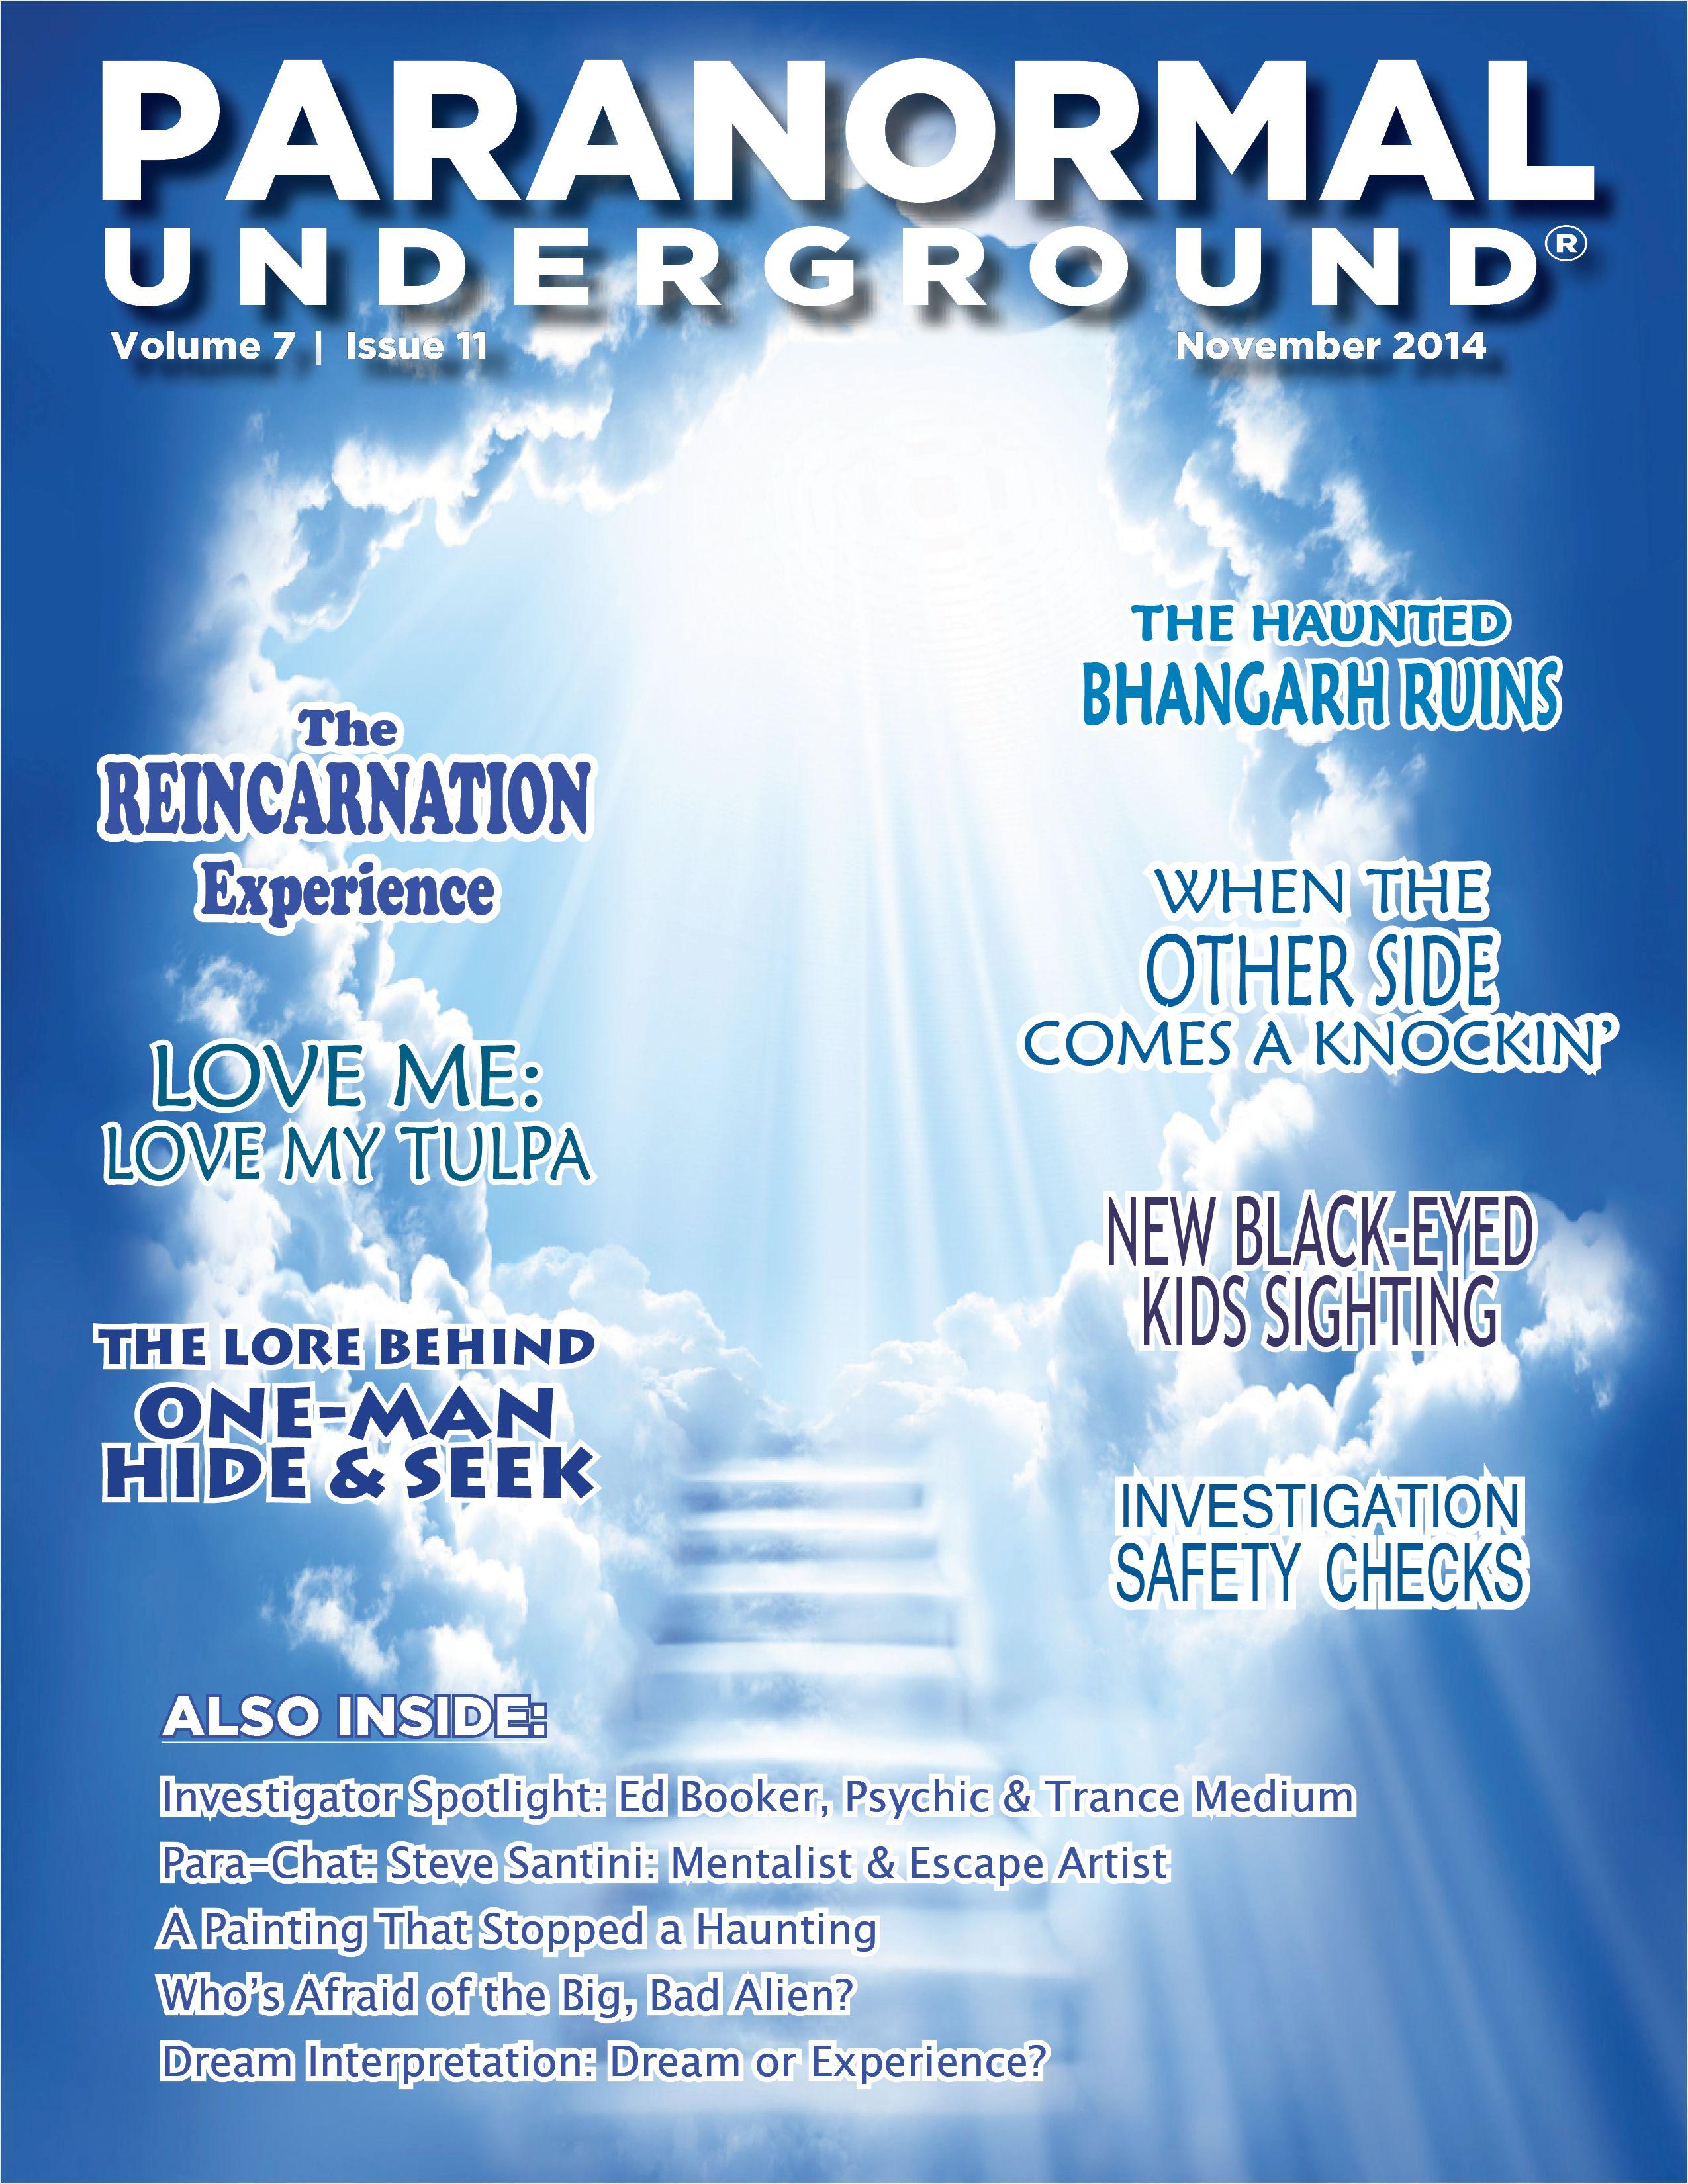 In this issue of Paranormal Underground magazine, we